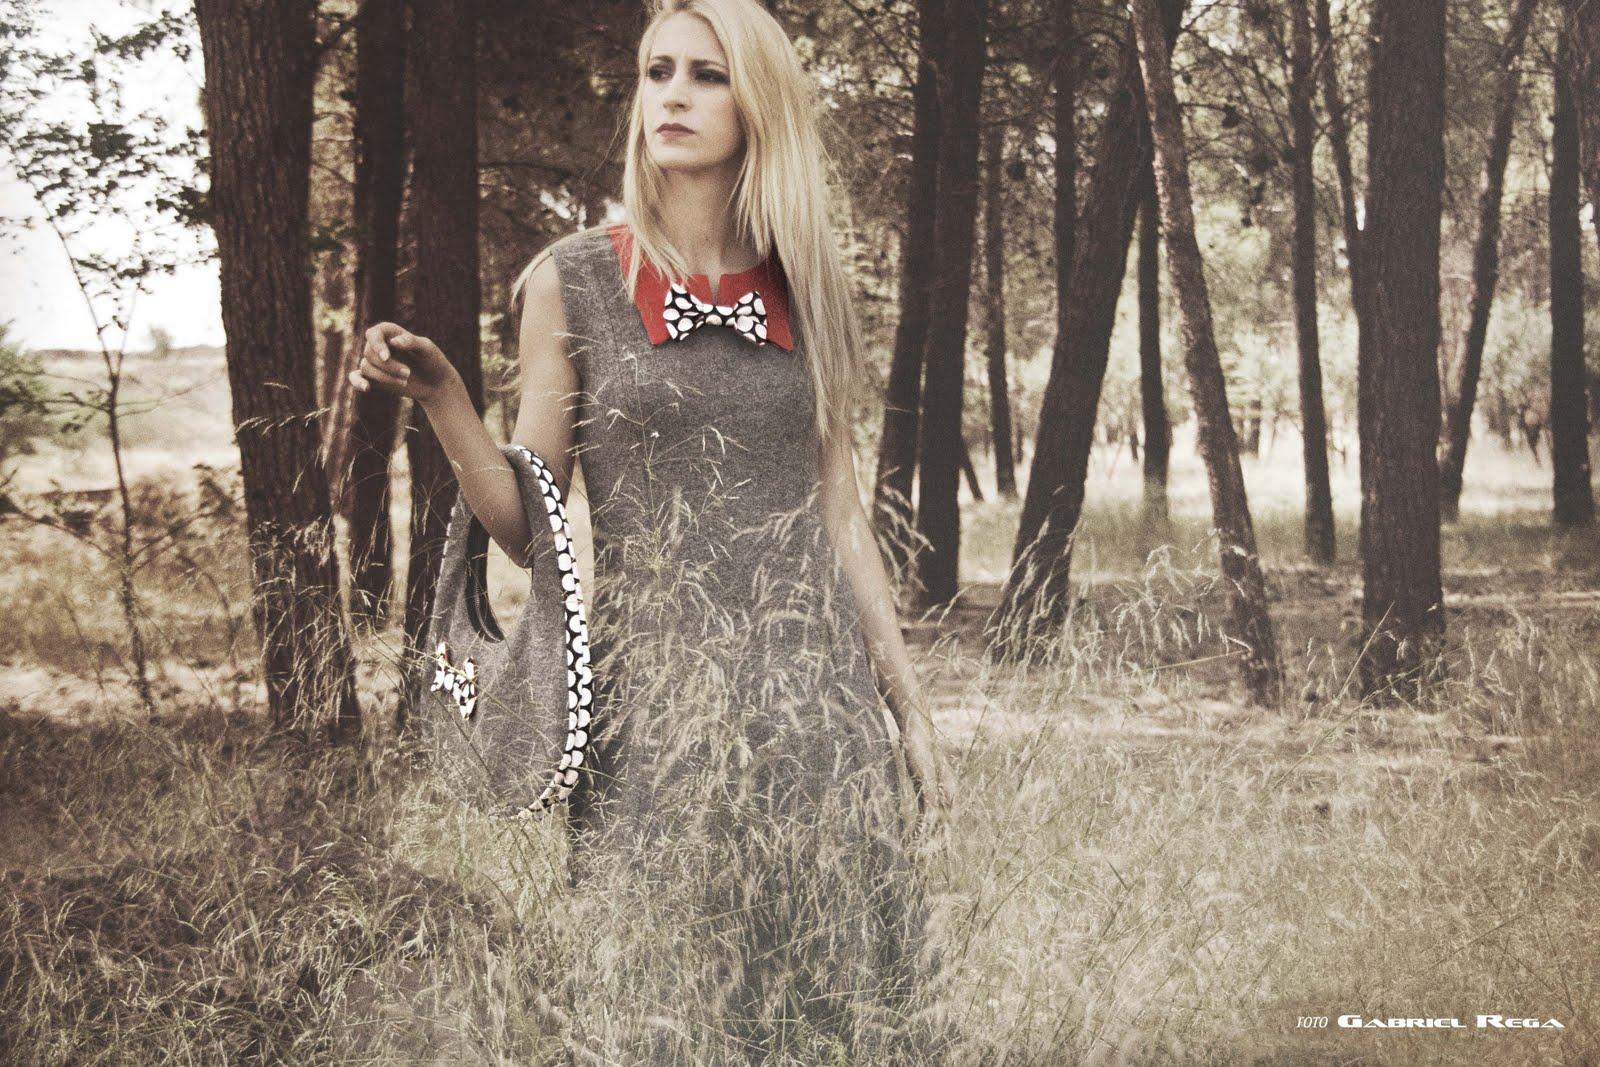 wool boucle dress by Senorita Martita